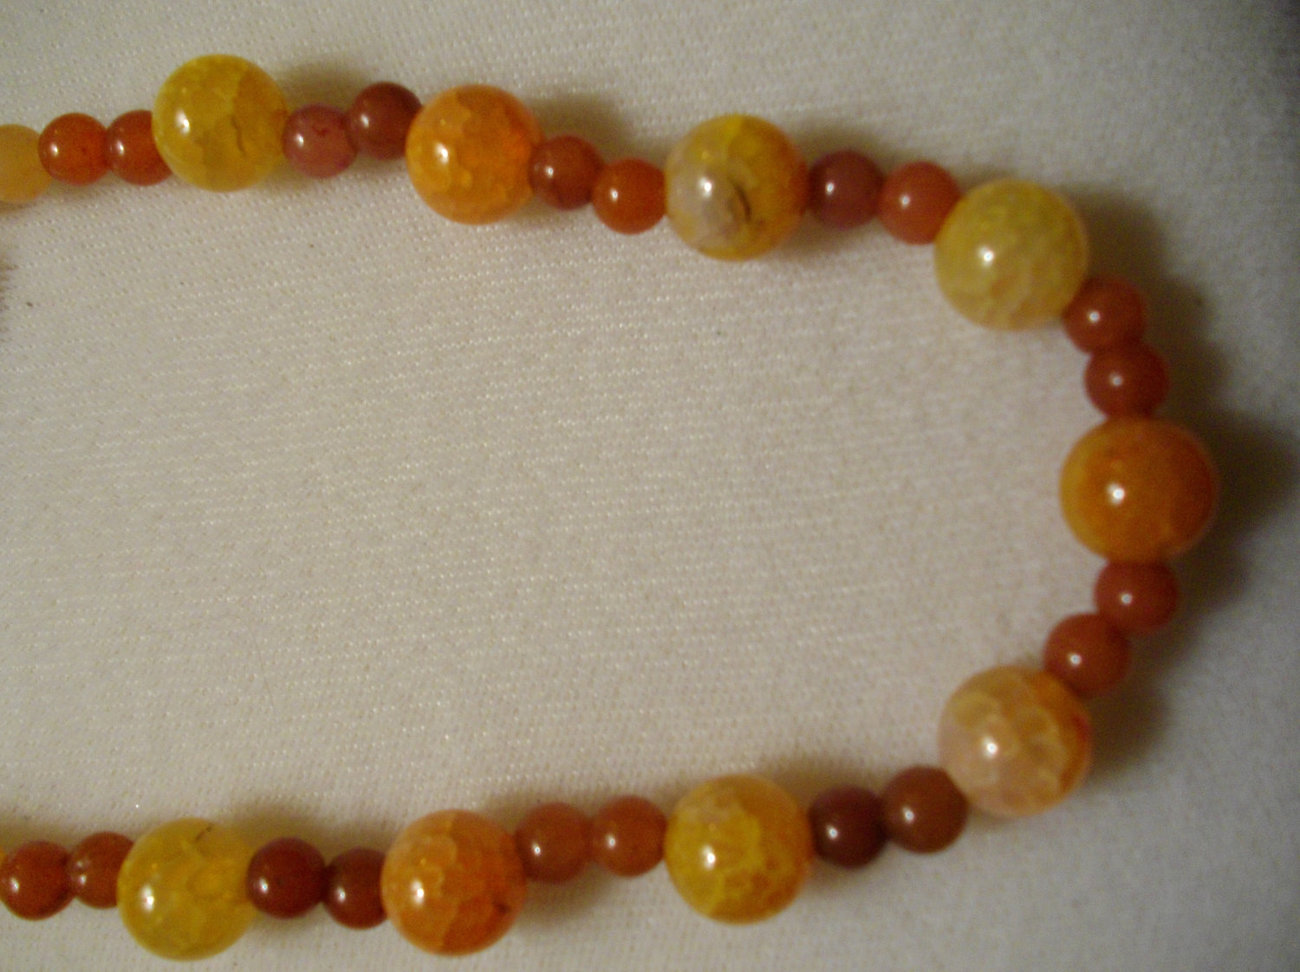 Red Adventurine And Mandarin Dragon Vein Agate Necklace Set